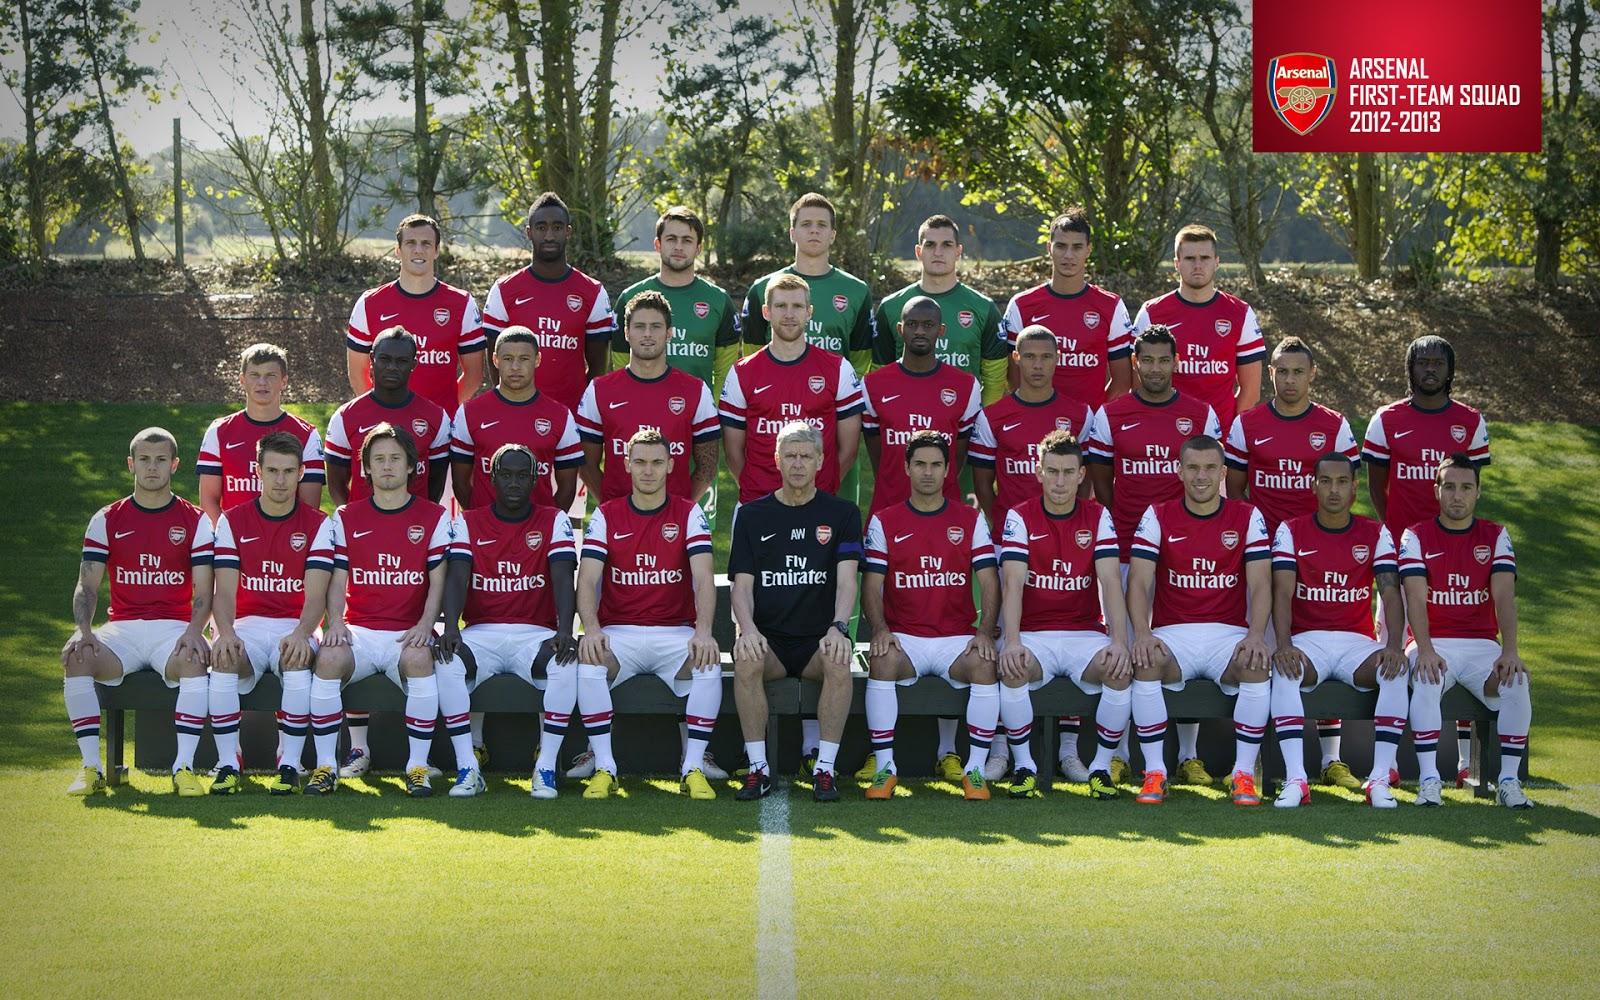 wallpapers hd for mac: Arsenal FC Wallpaper 2013 |Arsenal Gunners 2013